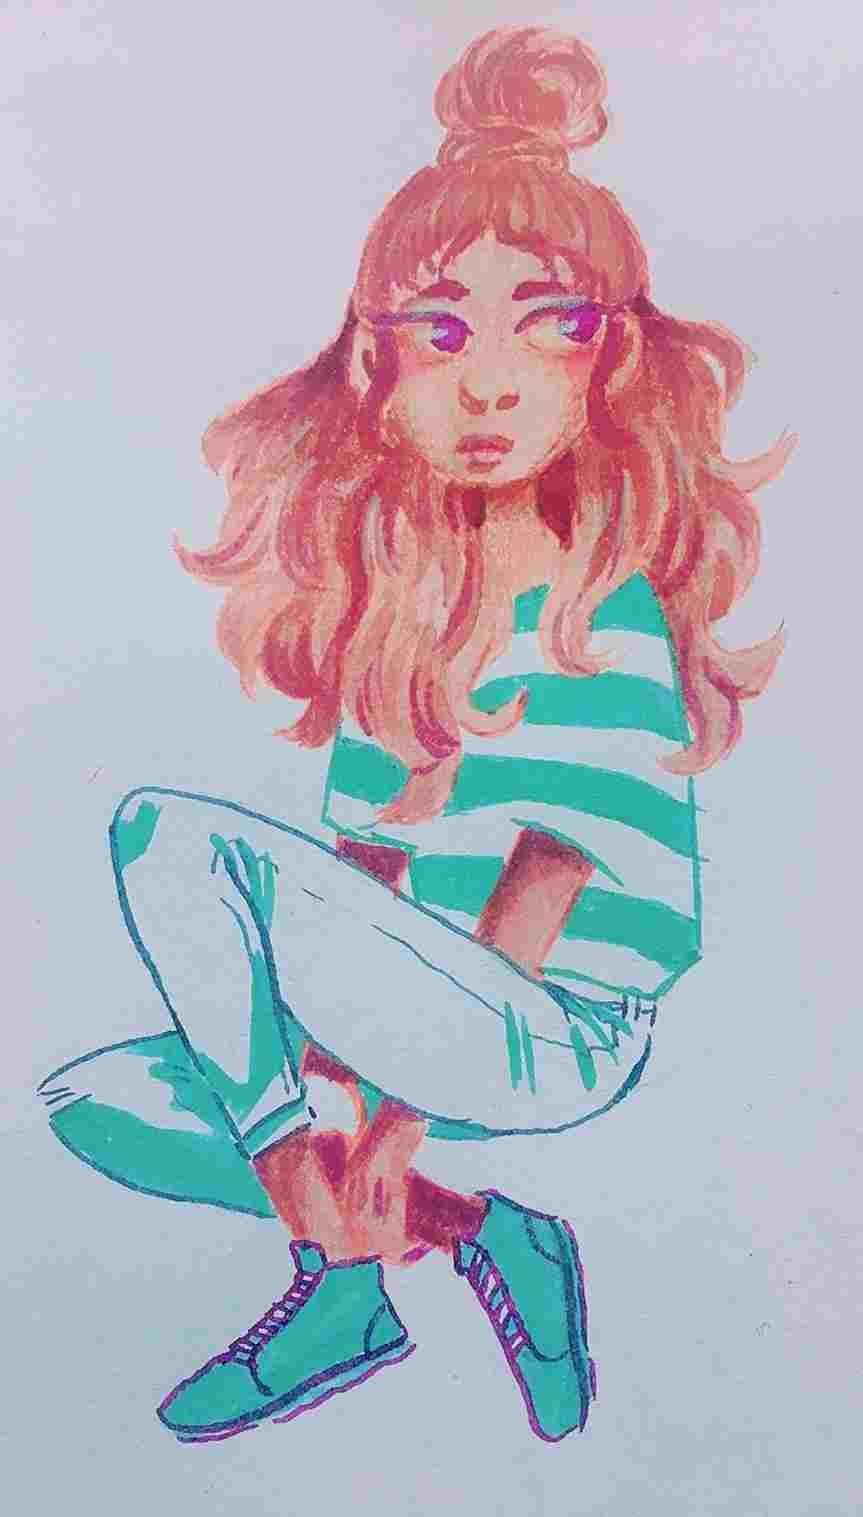 Cute Girl Anime Wallpaper Apk Aesthetic Emo Love Wallpapers Top Free Aesthetic Emo